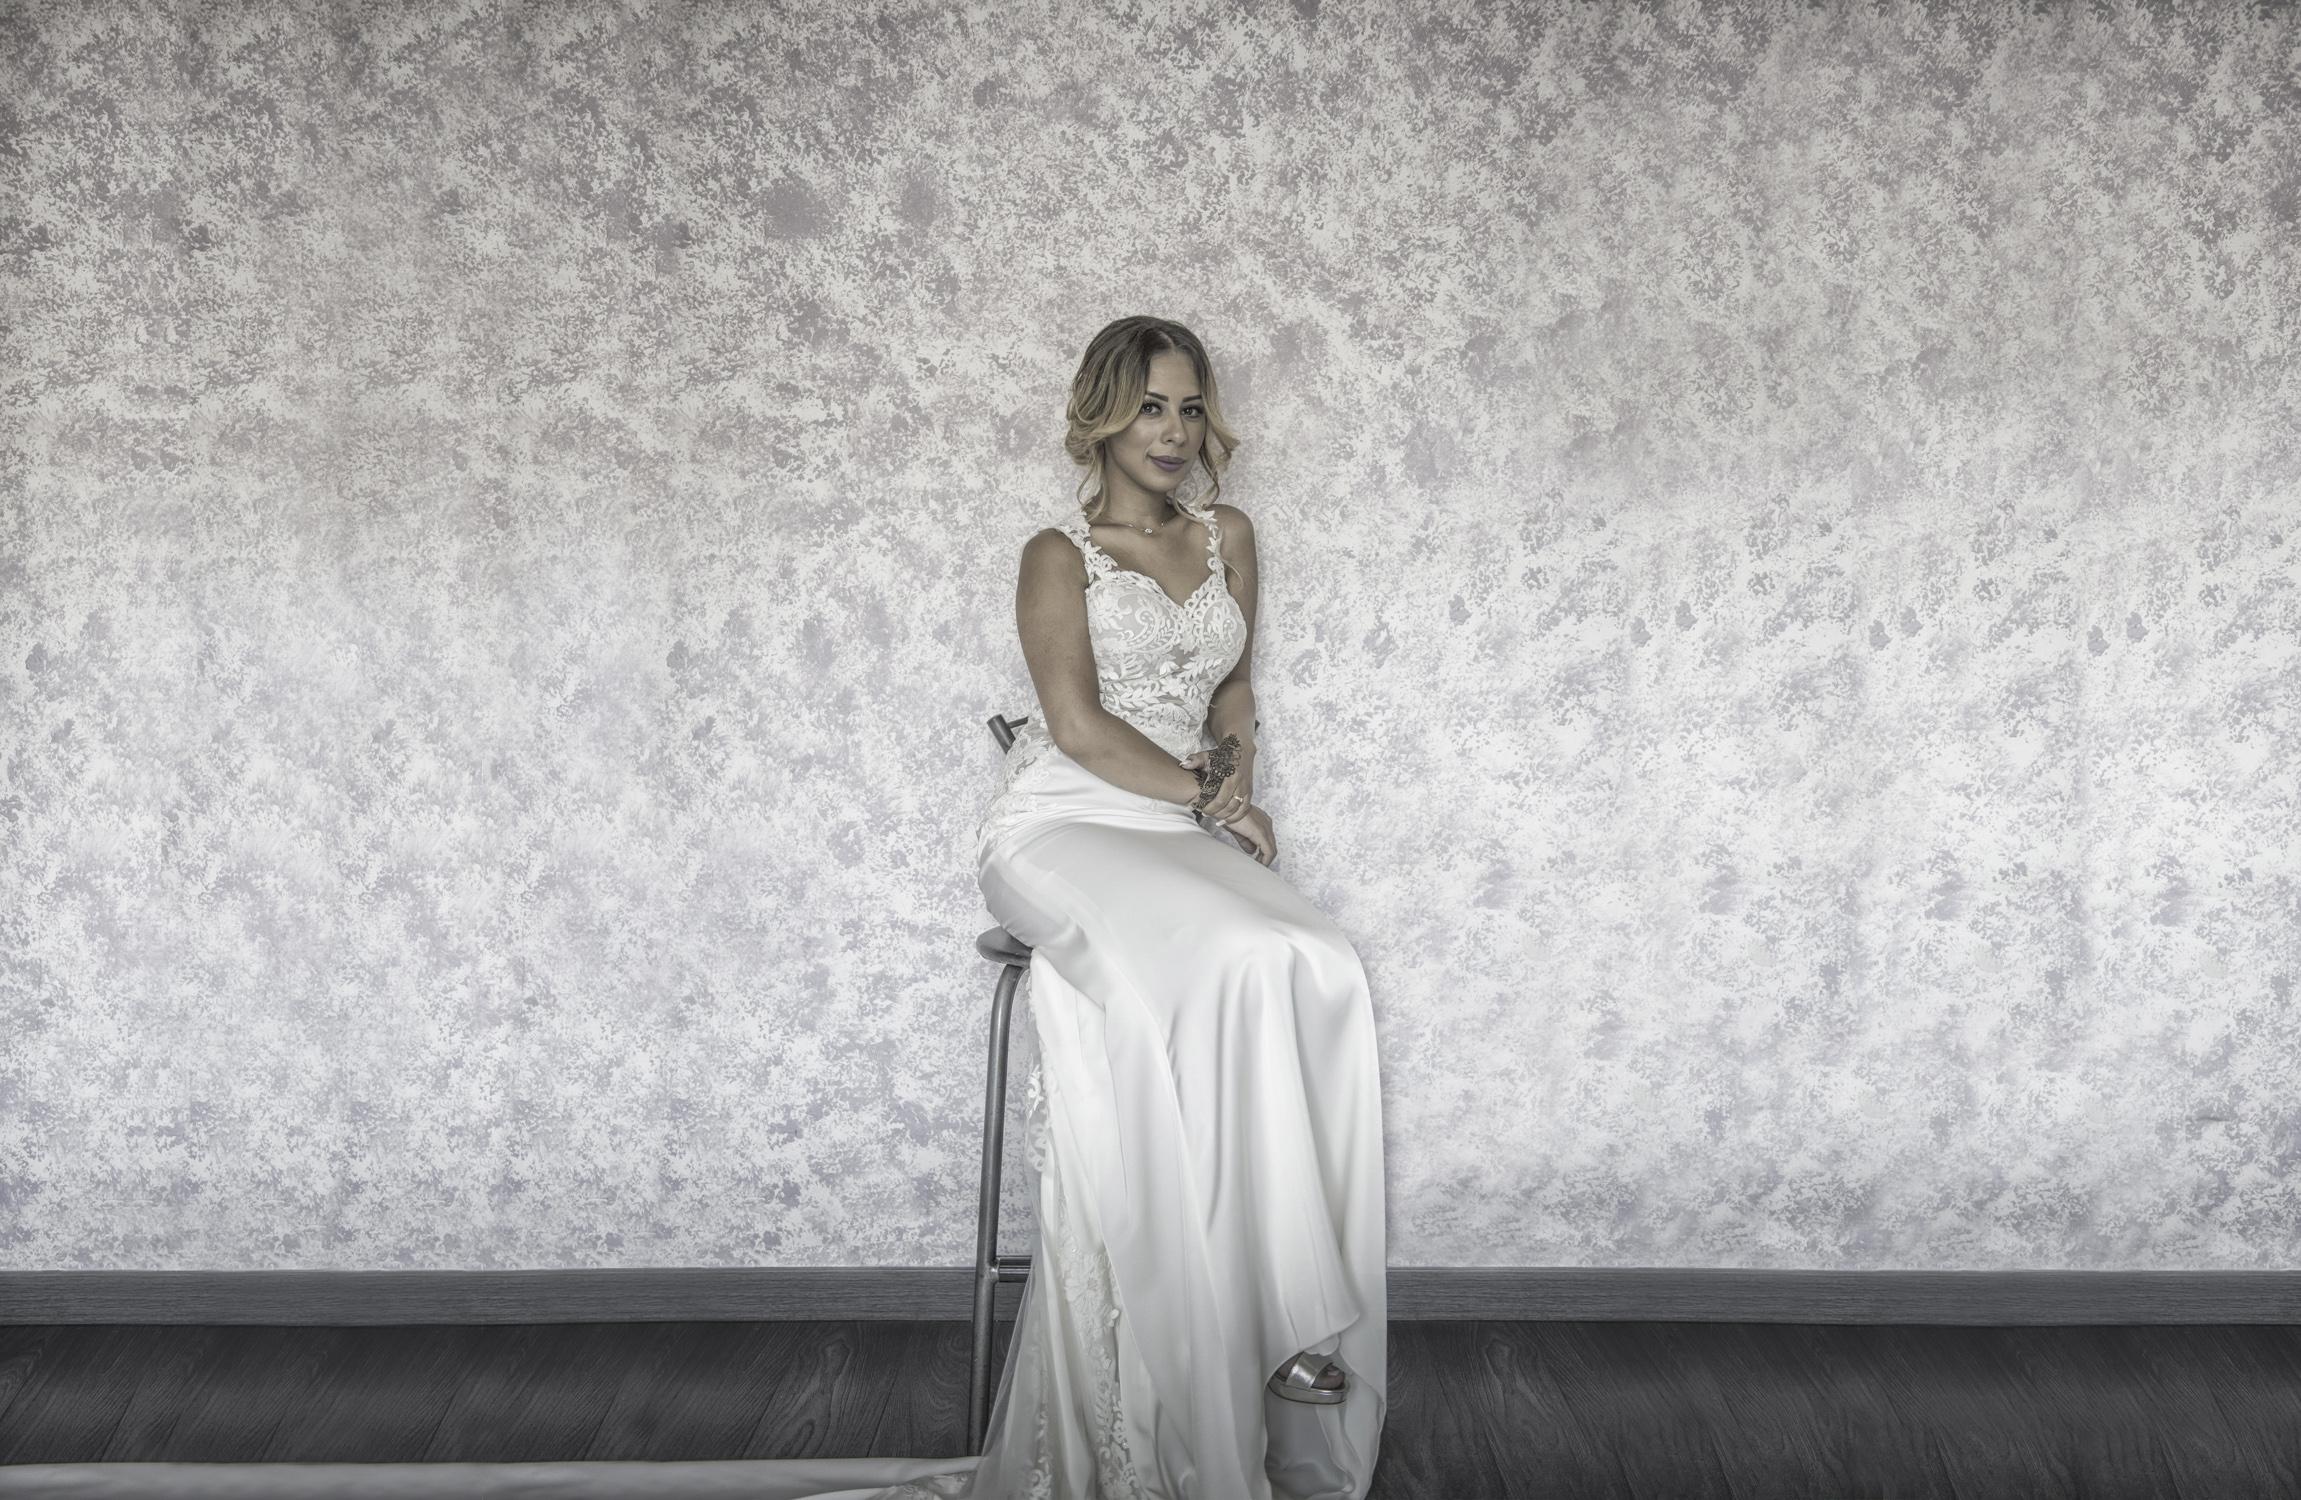 photographe geneve mariage suisse